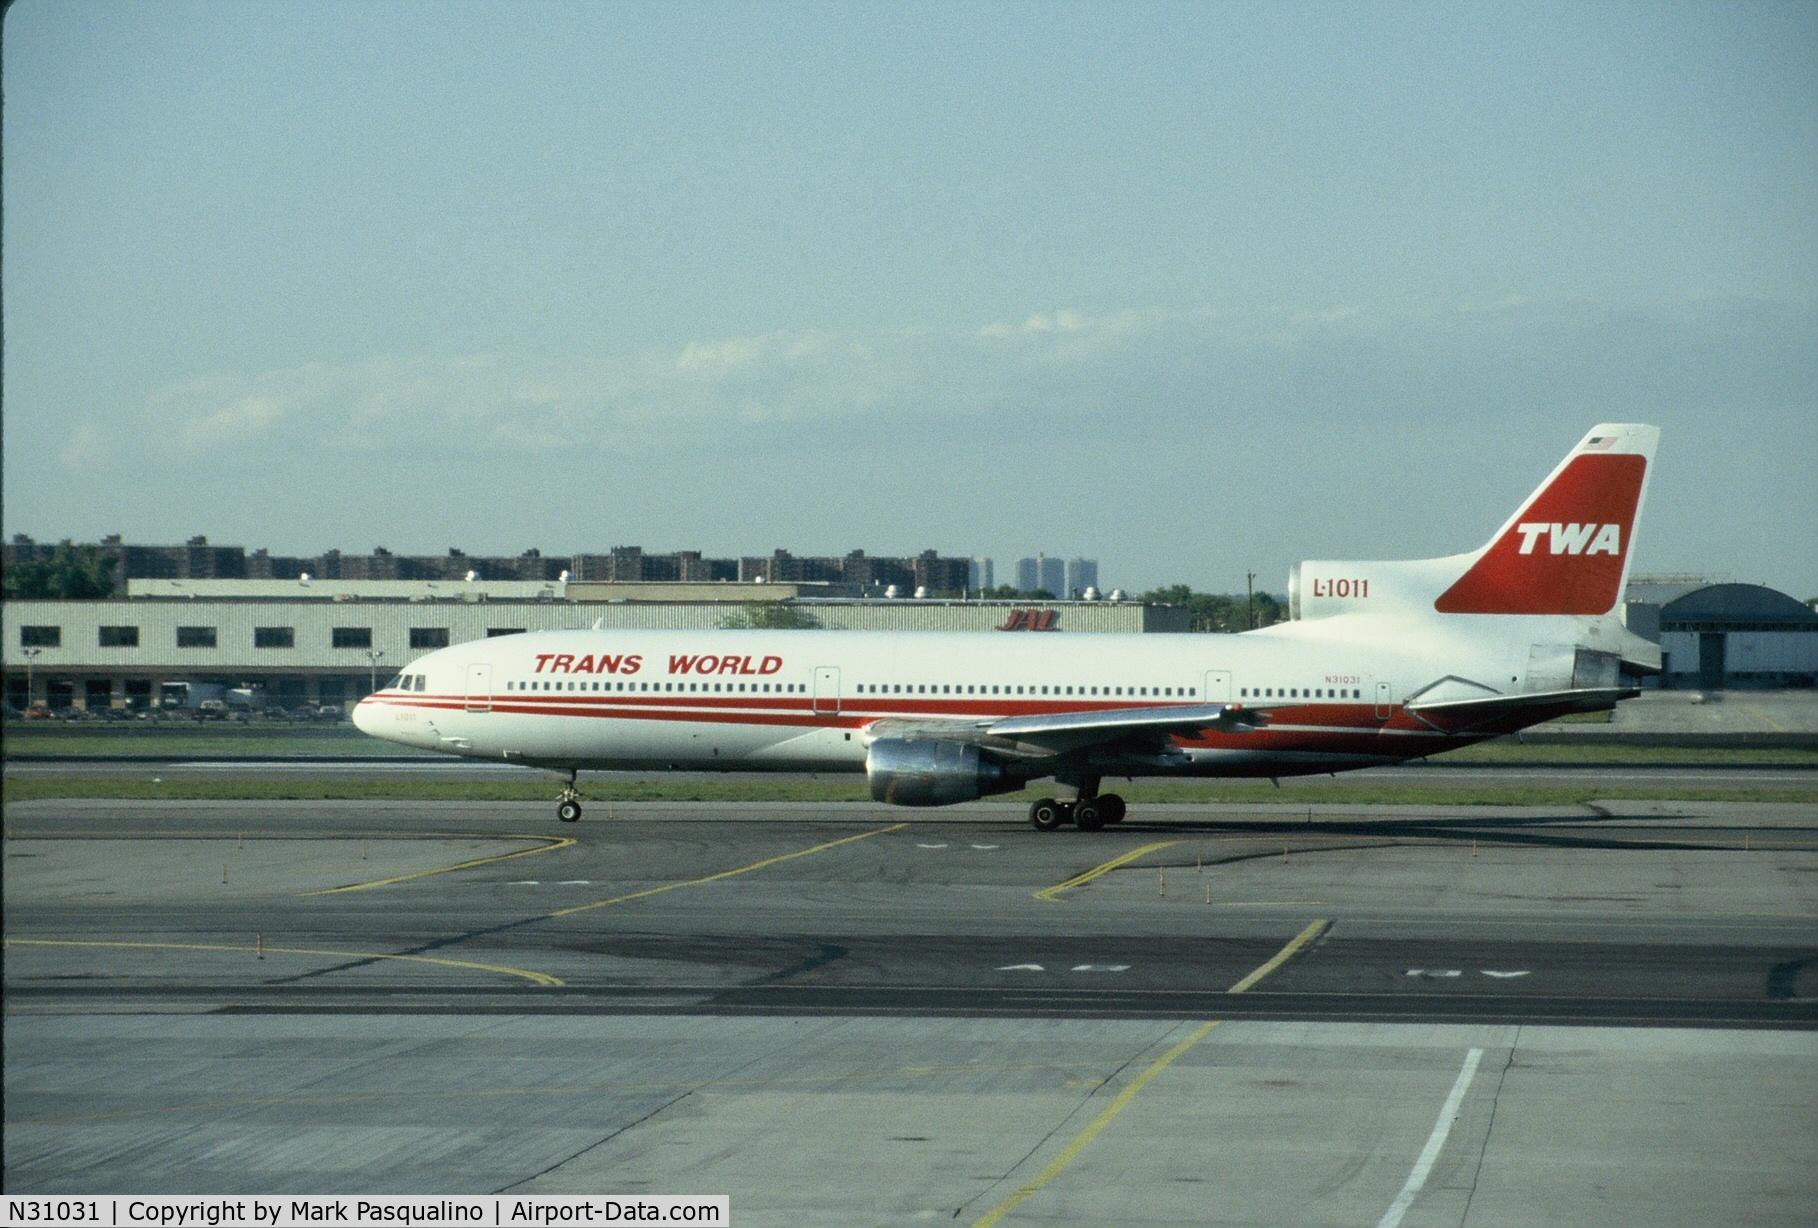 N31031, Lockheed L-1011-385-1-15 C/N 193B-1115, Lockheed L-1011